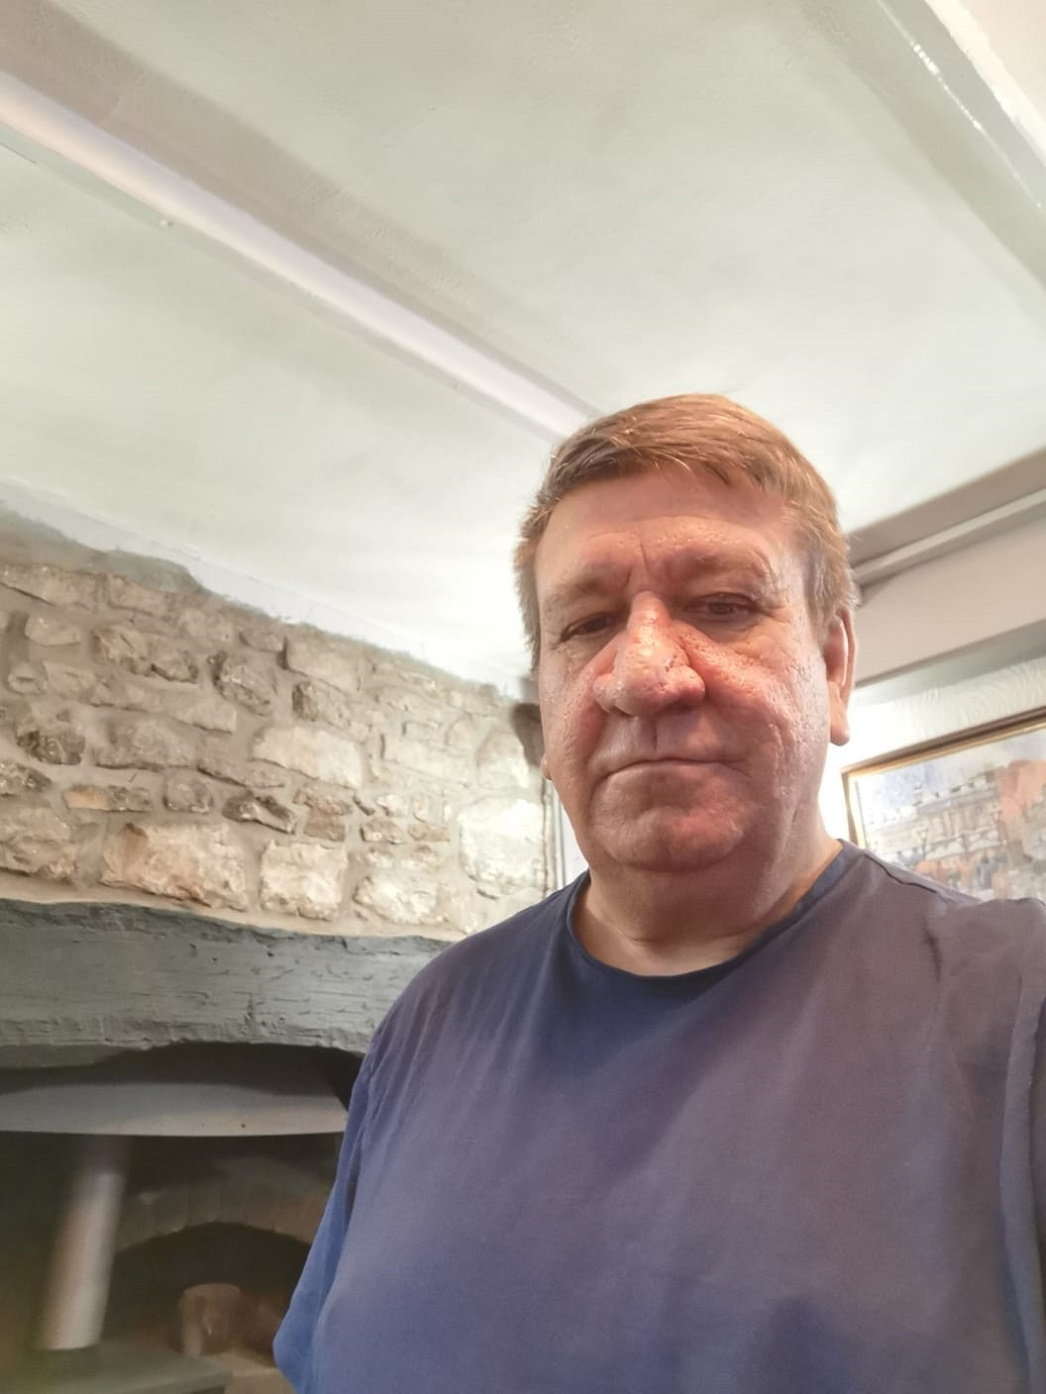 Gerwyn Evans, owner of The Rising Sun in Abersychan. Picture: Gerwyn Evans.